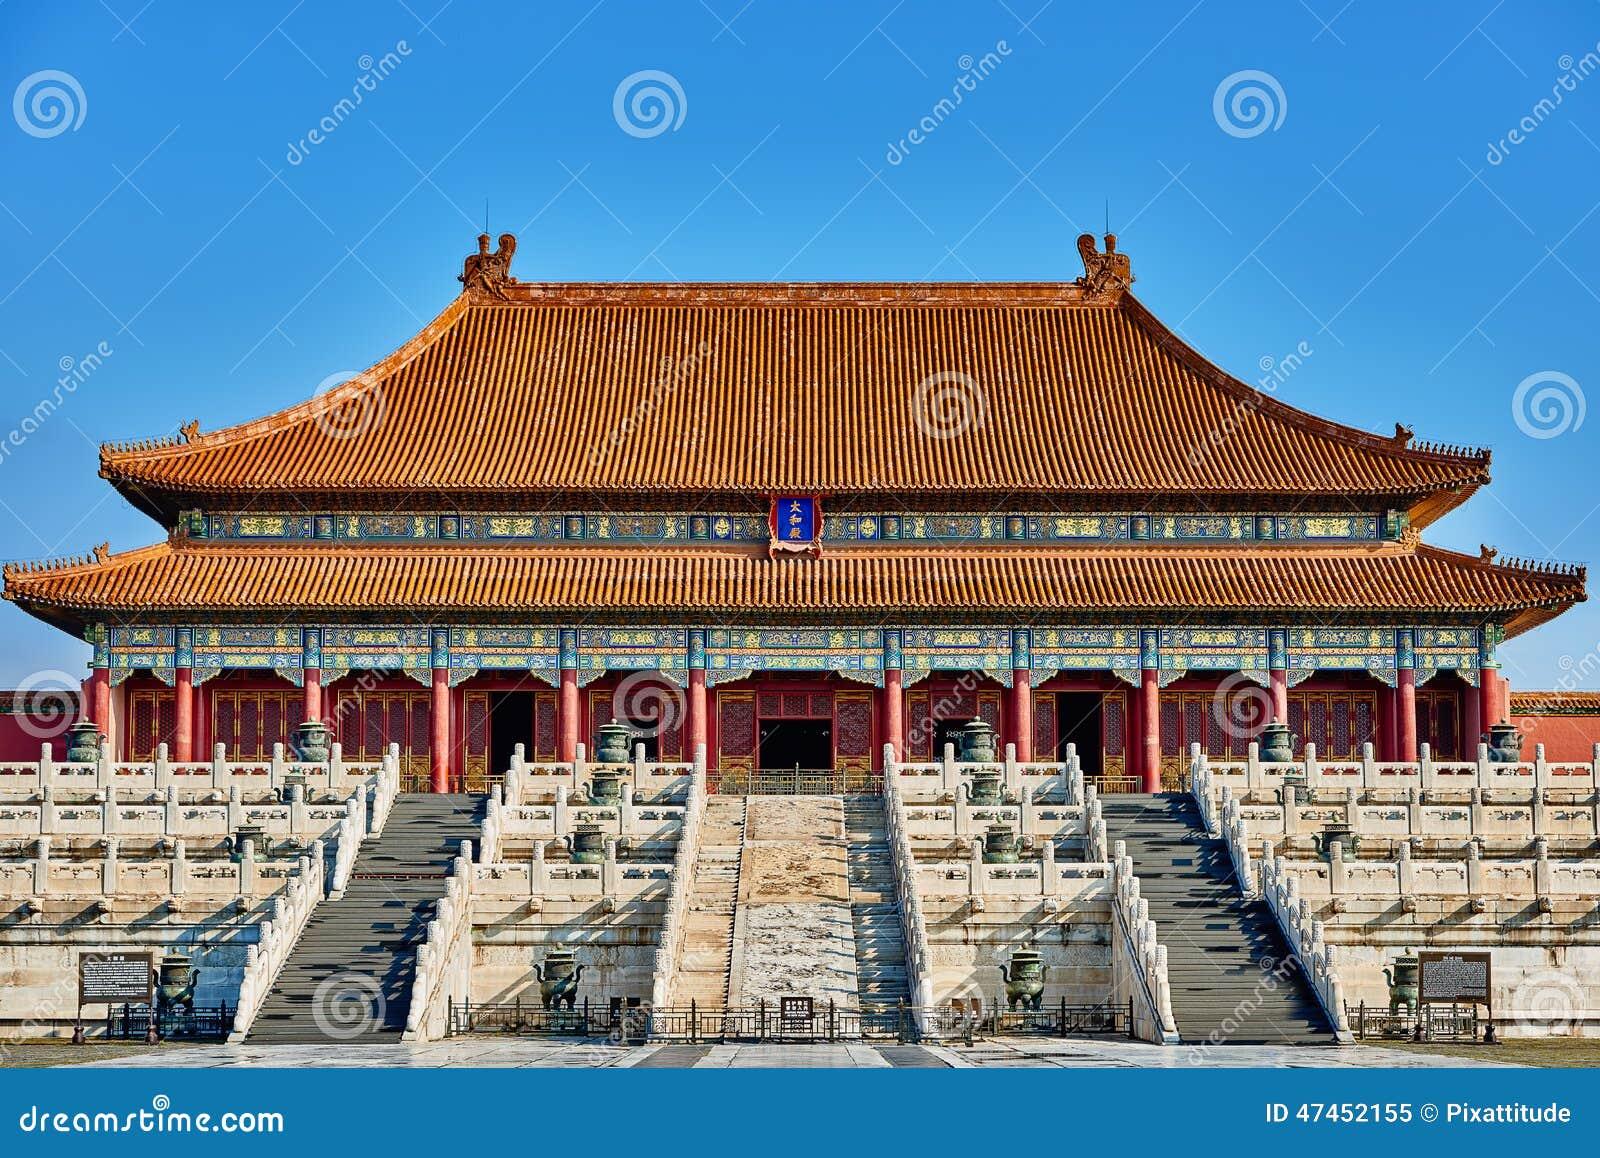 Maison de Taihedian de Harmony Imperial Palace Forbidden City suprême